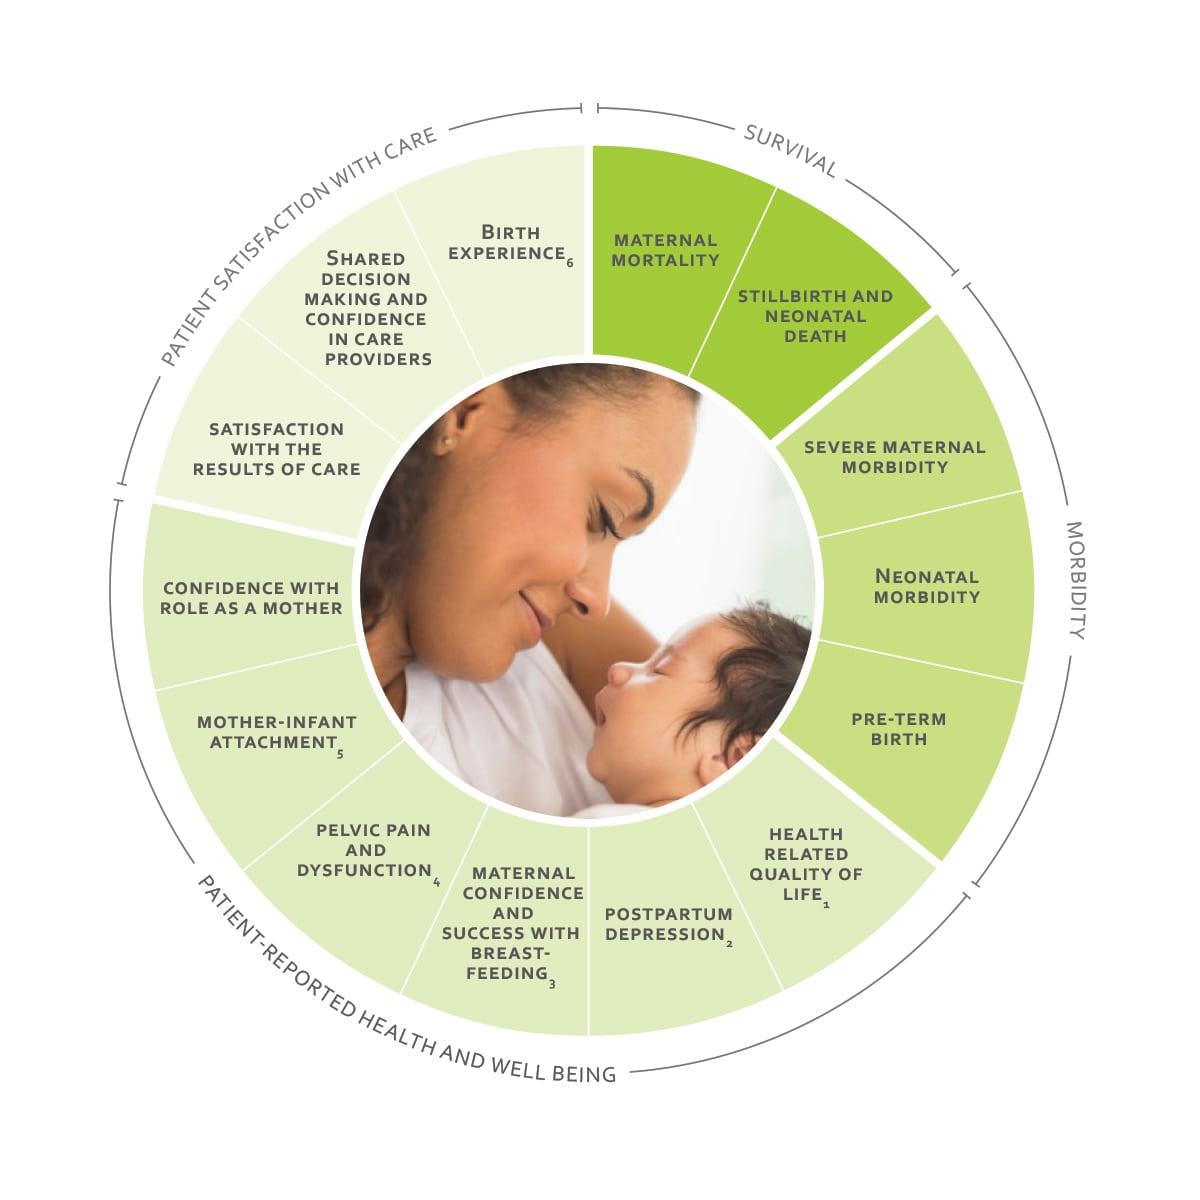 ICHOM Standard Sets Pregnancy and Childbirth Outcomes Wheel